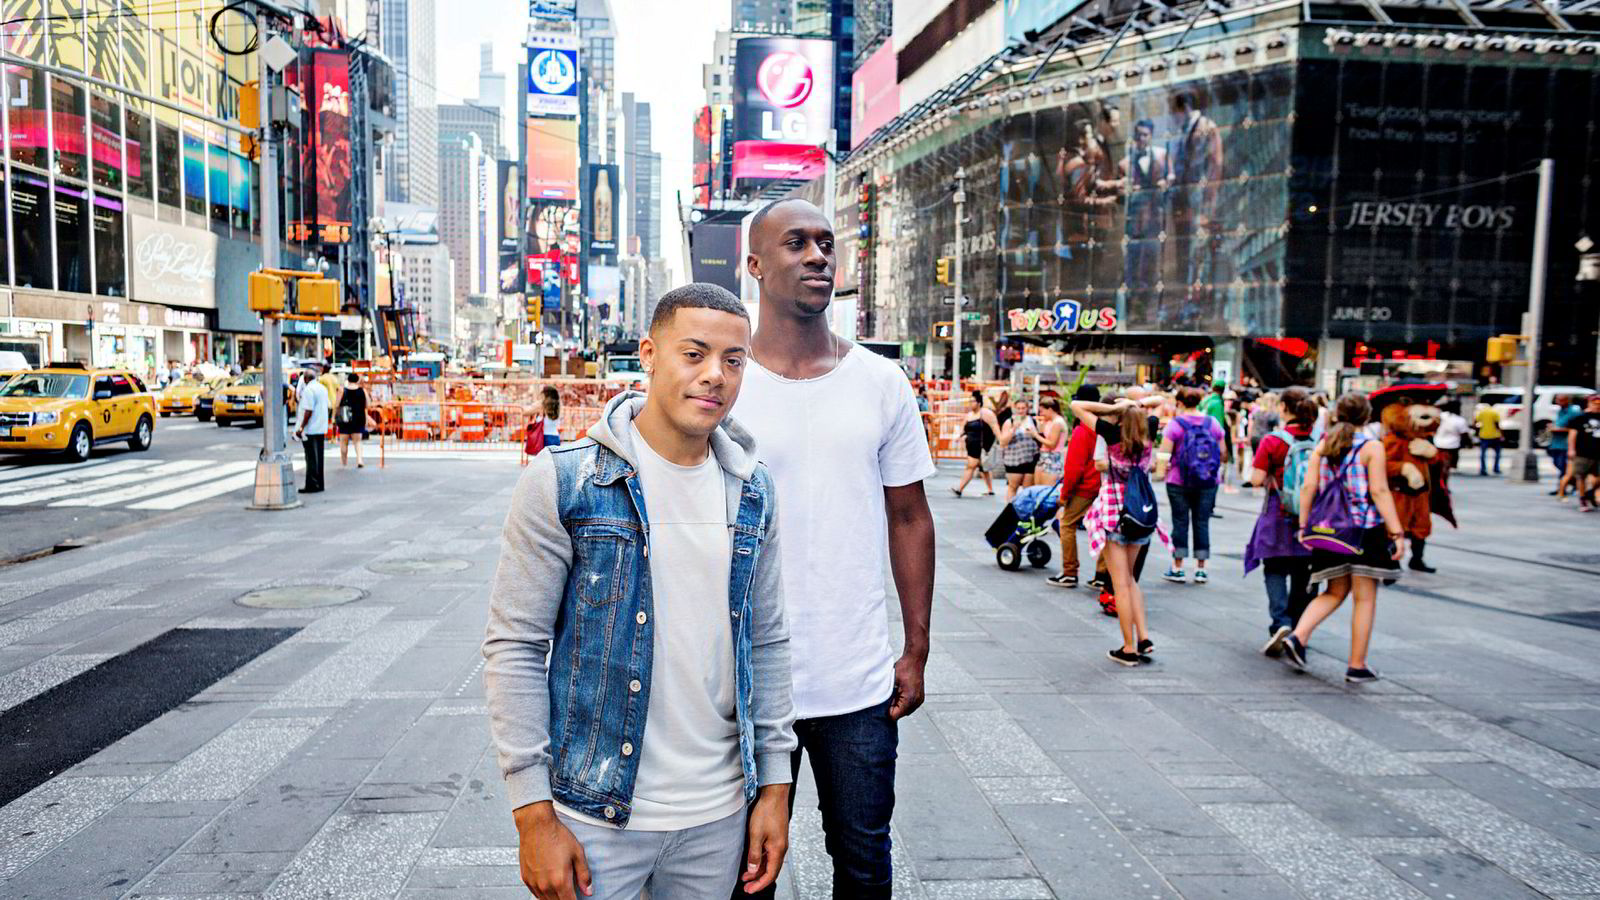 Onsdag ettermiddag kom nyheten at Nicolay Sereba (til venstre) og Vincent Dery bryter med Amanuel Kidane, som har vært duoens manager siden 2009.